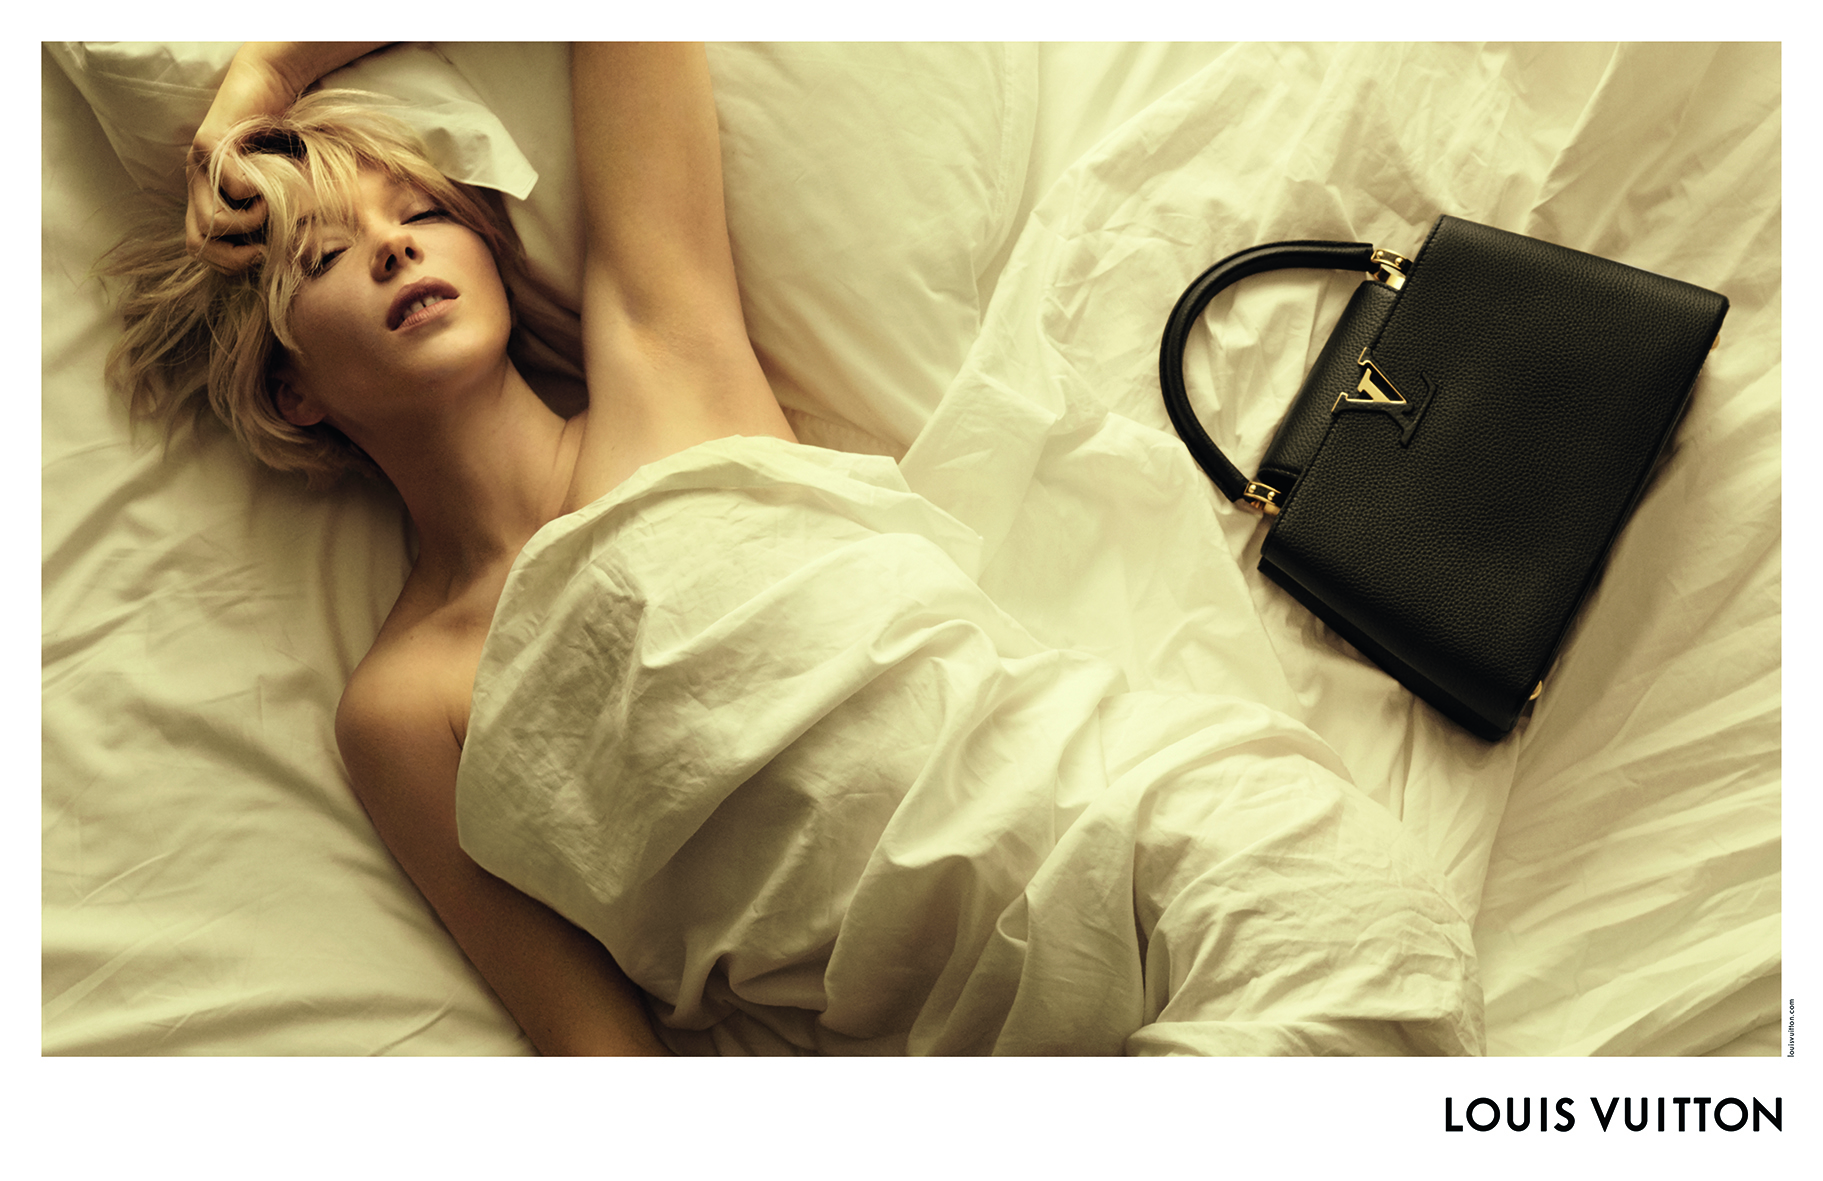 Léa Seydoux in the Louis Vuitton campaign for the Capucines handbag.